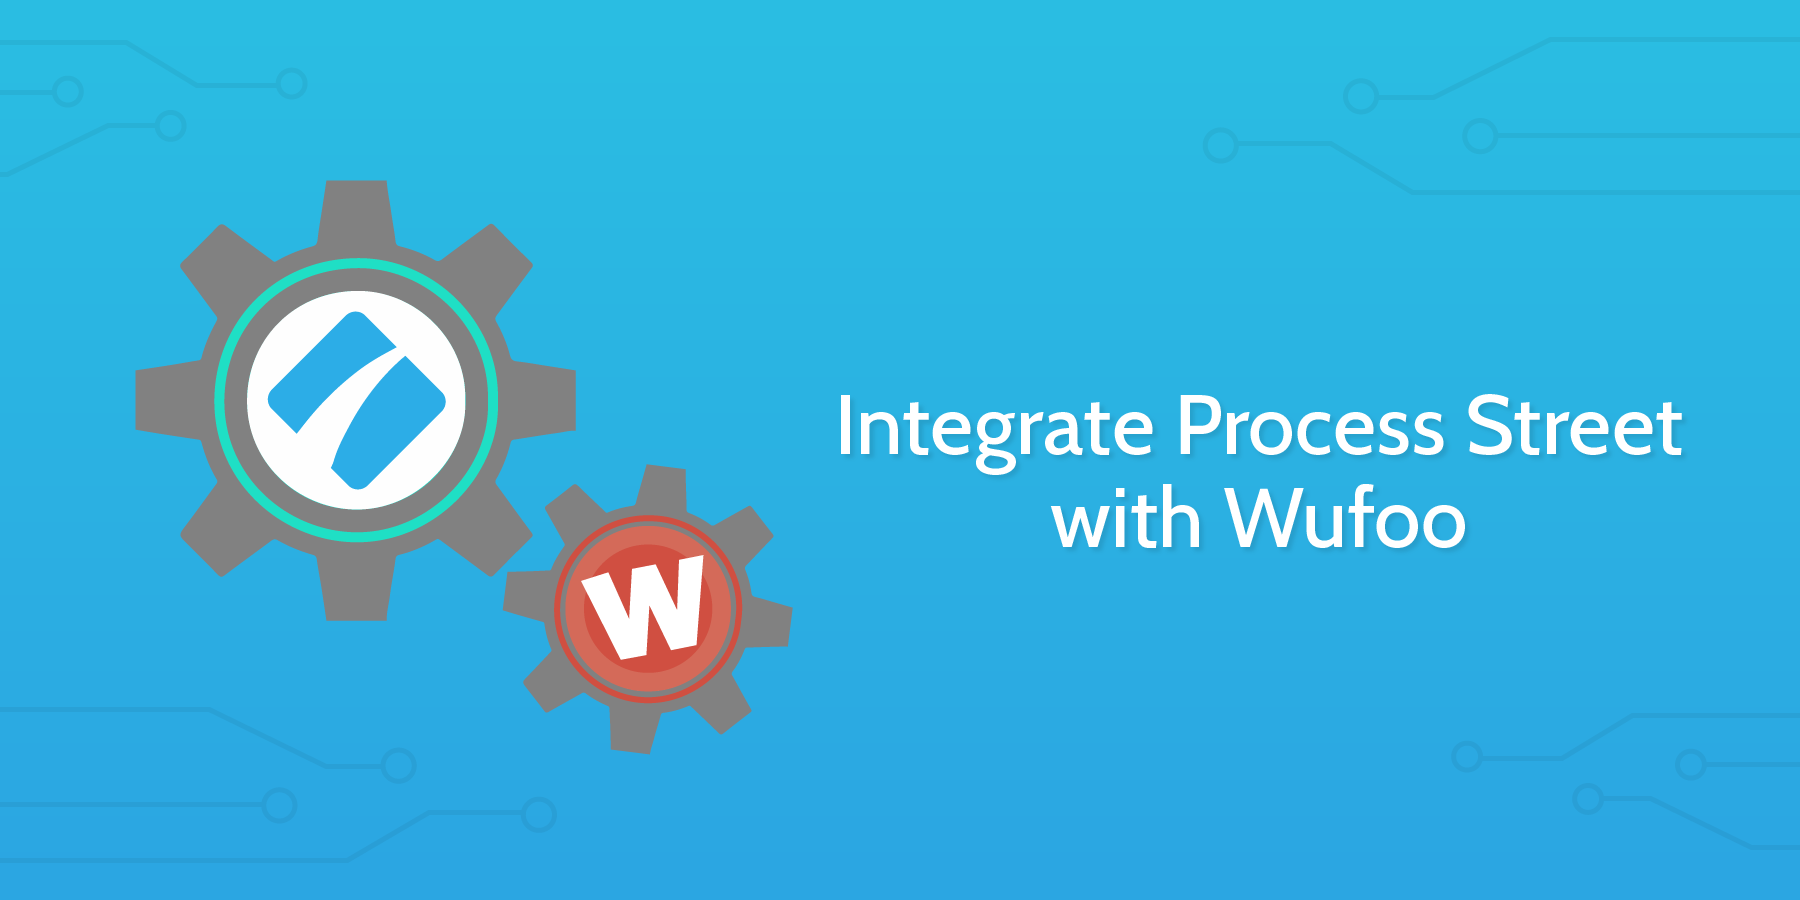 wufoo and process street integration header